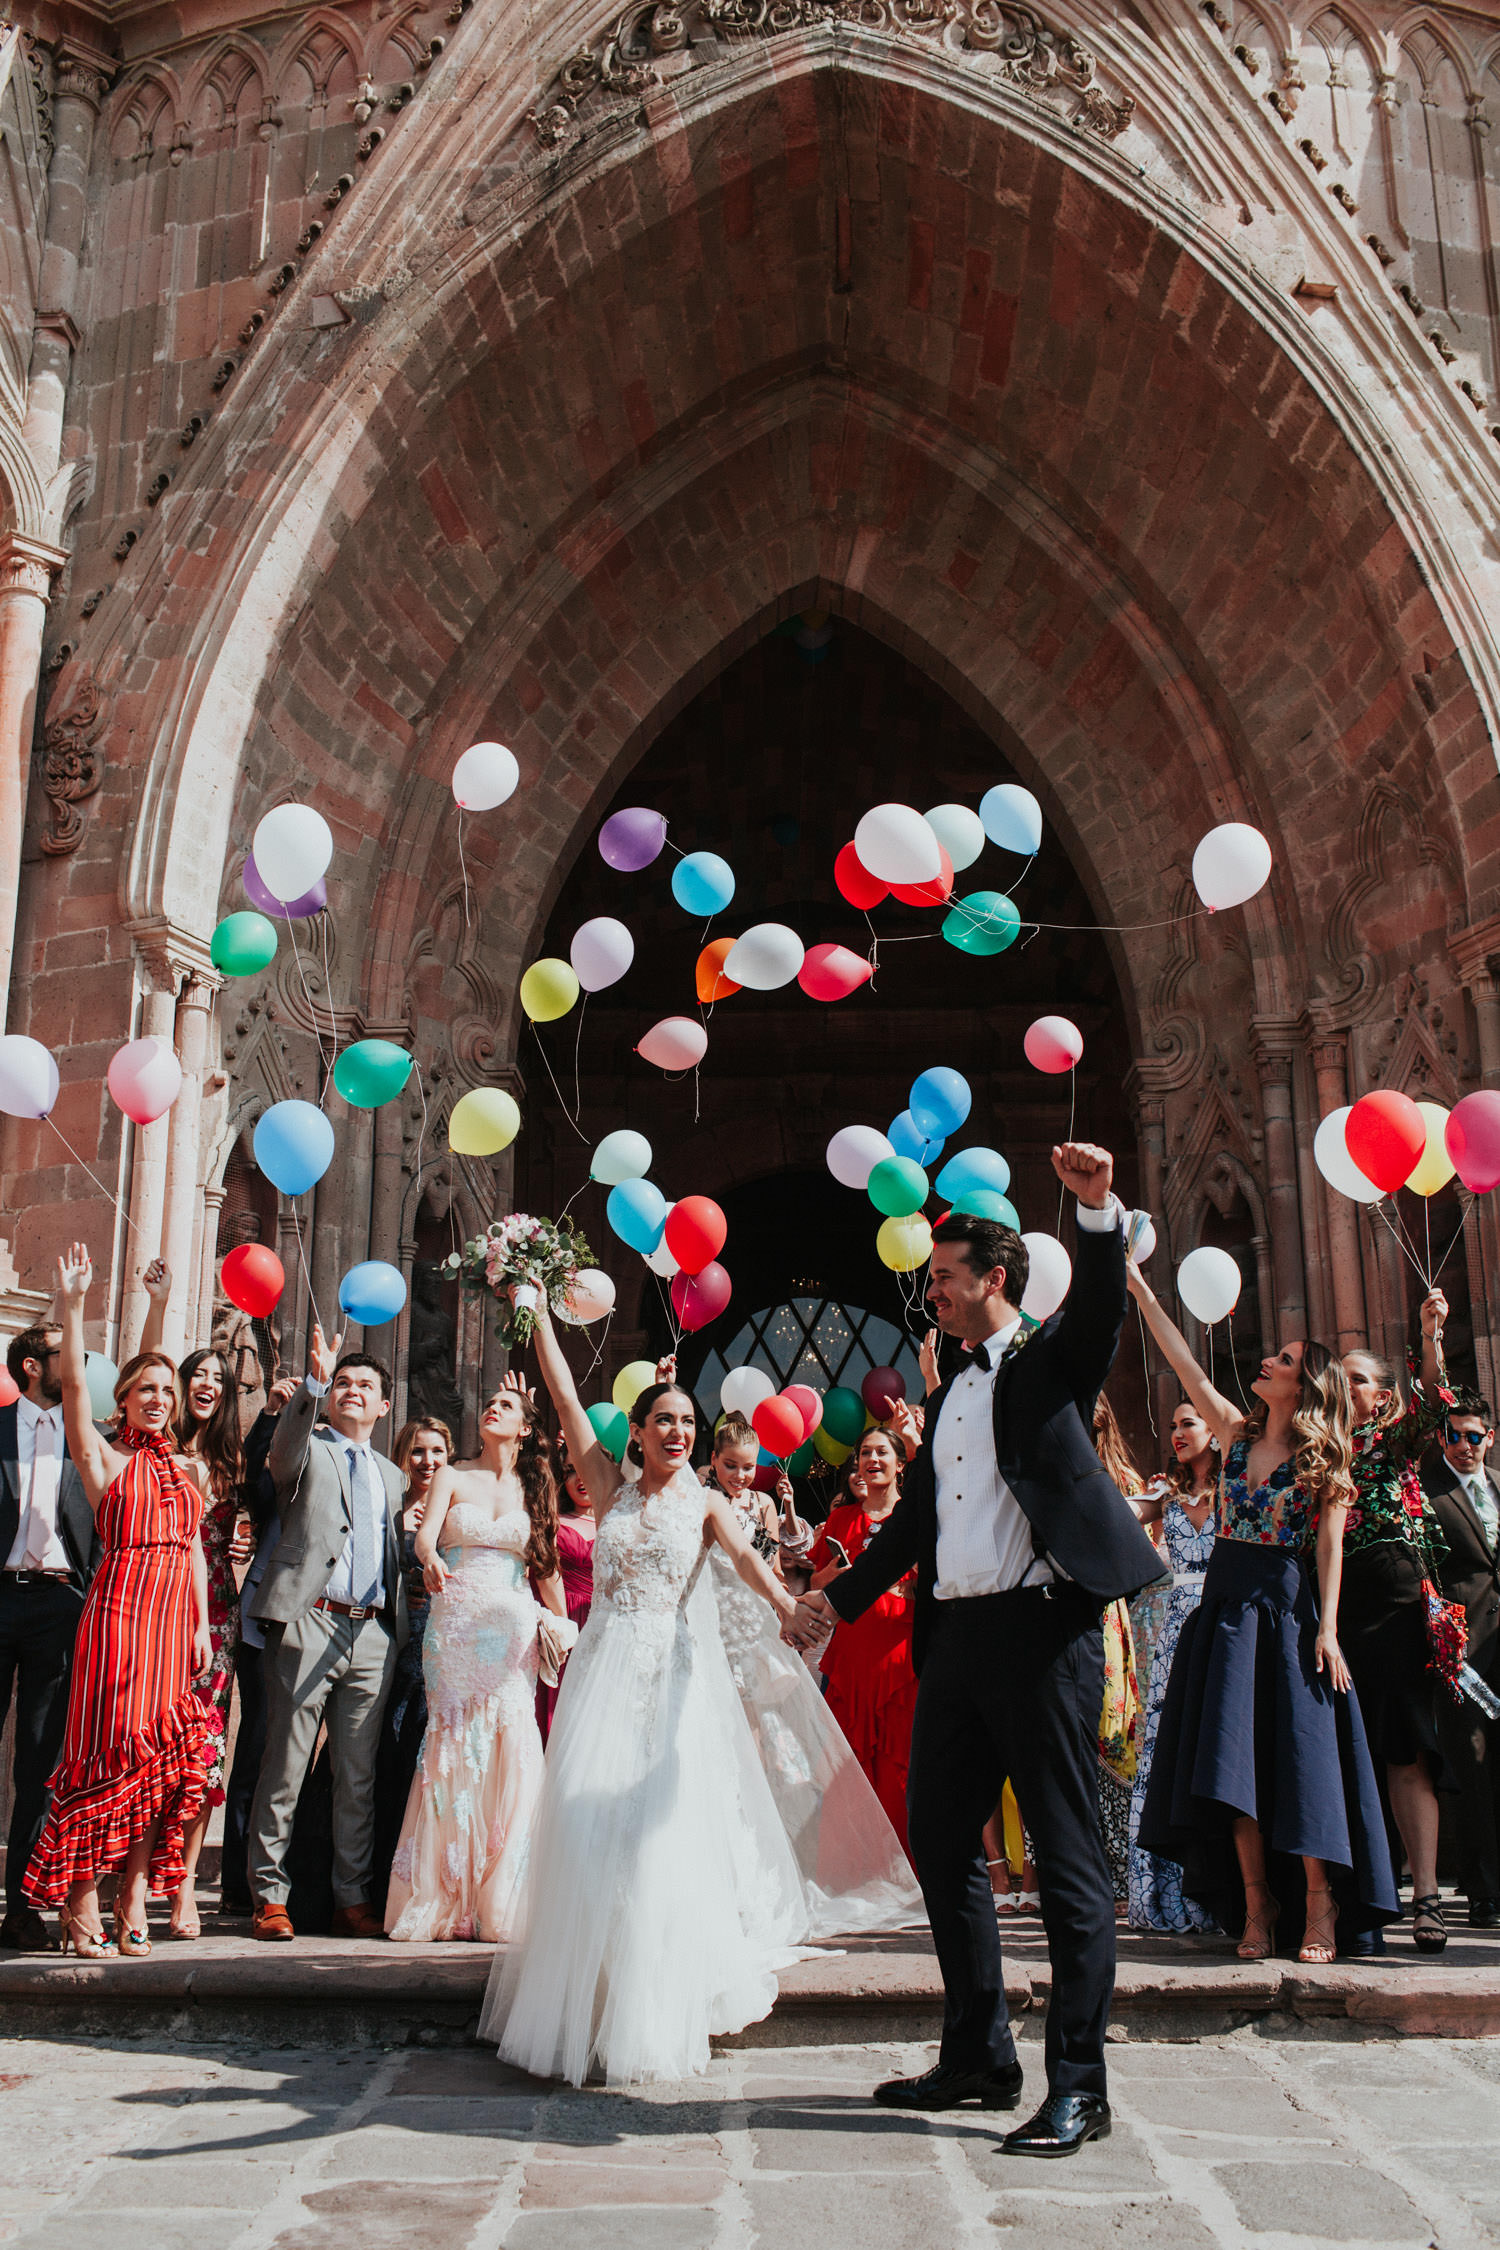 San-Miguel-de-Allende-Wedding-Photography-Parroquia-Instituto-Boda-Fotografia-Fer-Sergio-Pierce-Lifestyle-Photography0164.JPG